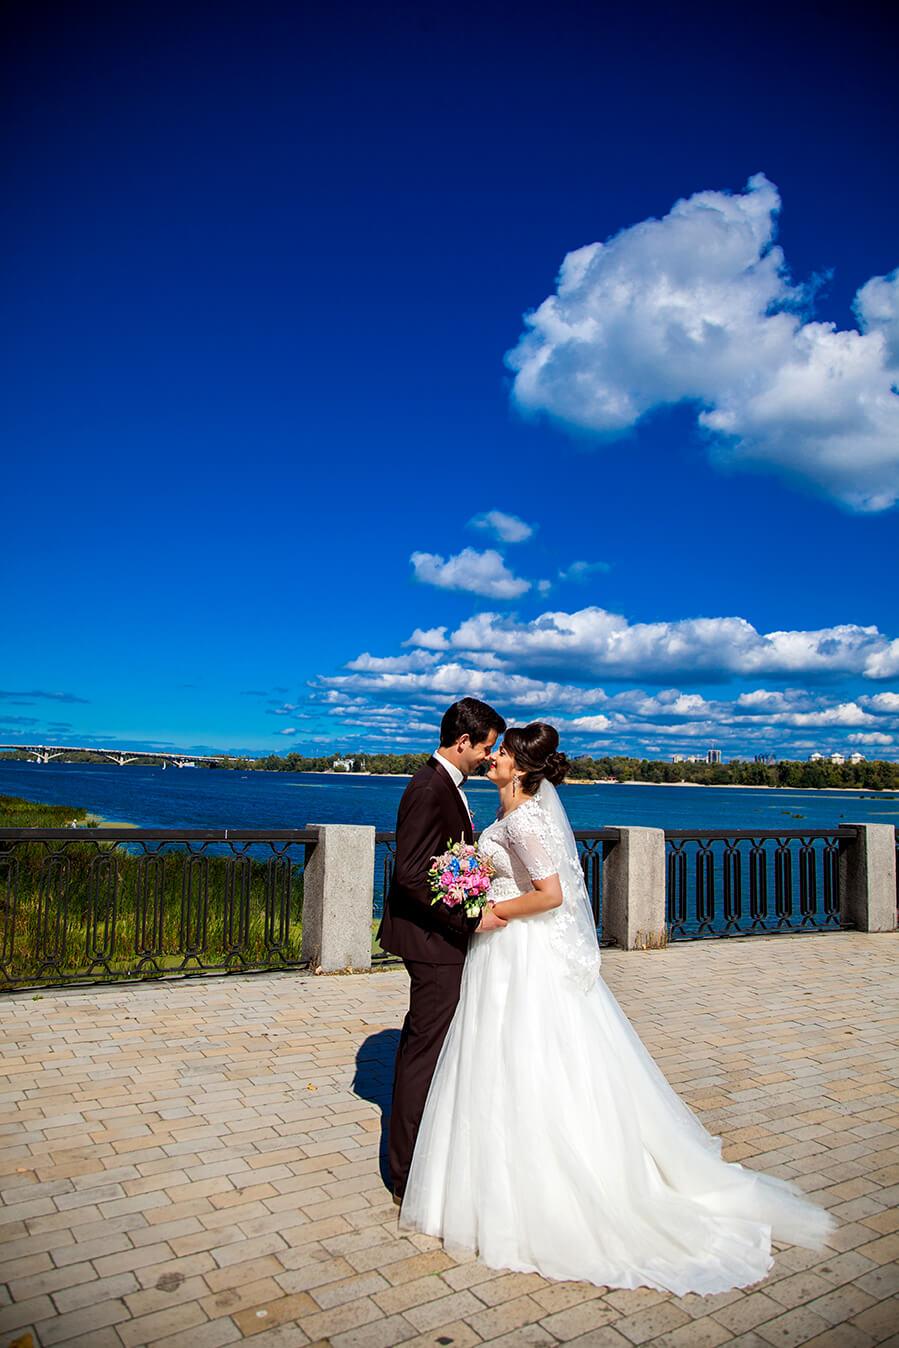 1-svadebnoe-foto-kiev-svadebnaja-progulka-mesta-dlja-svadebnoj-fotosessii-8